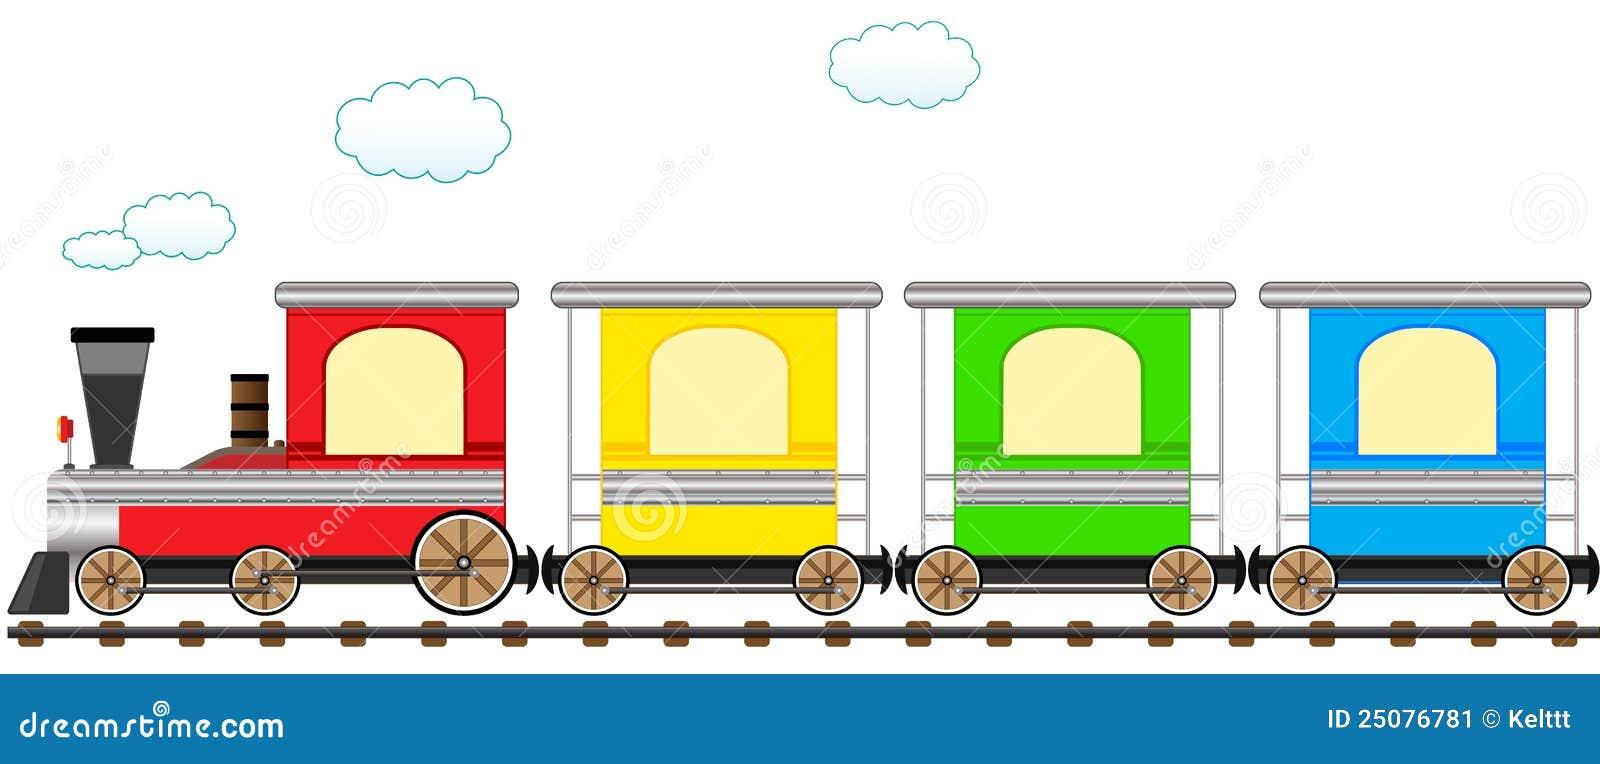 cartoon cute colorful train in railroad stock vector locomotive clip art pictures locomotive clip art free